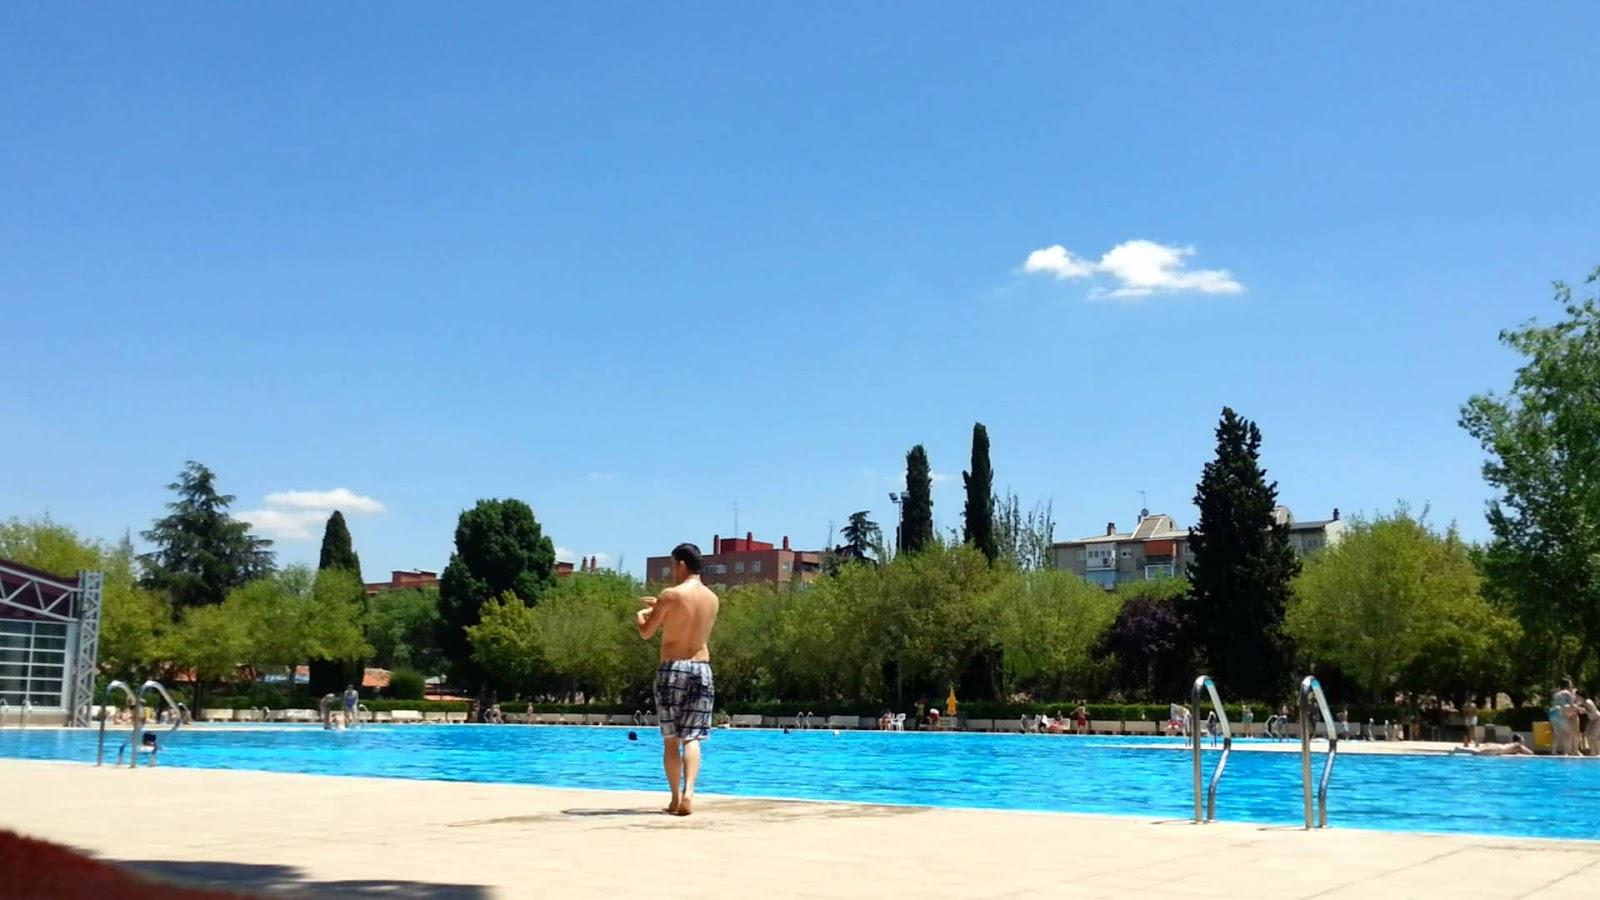 la piscina de verano de aluche la tercera m s visitada de